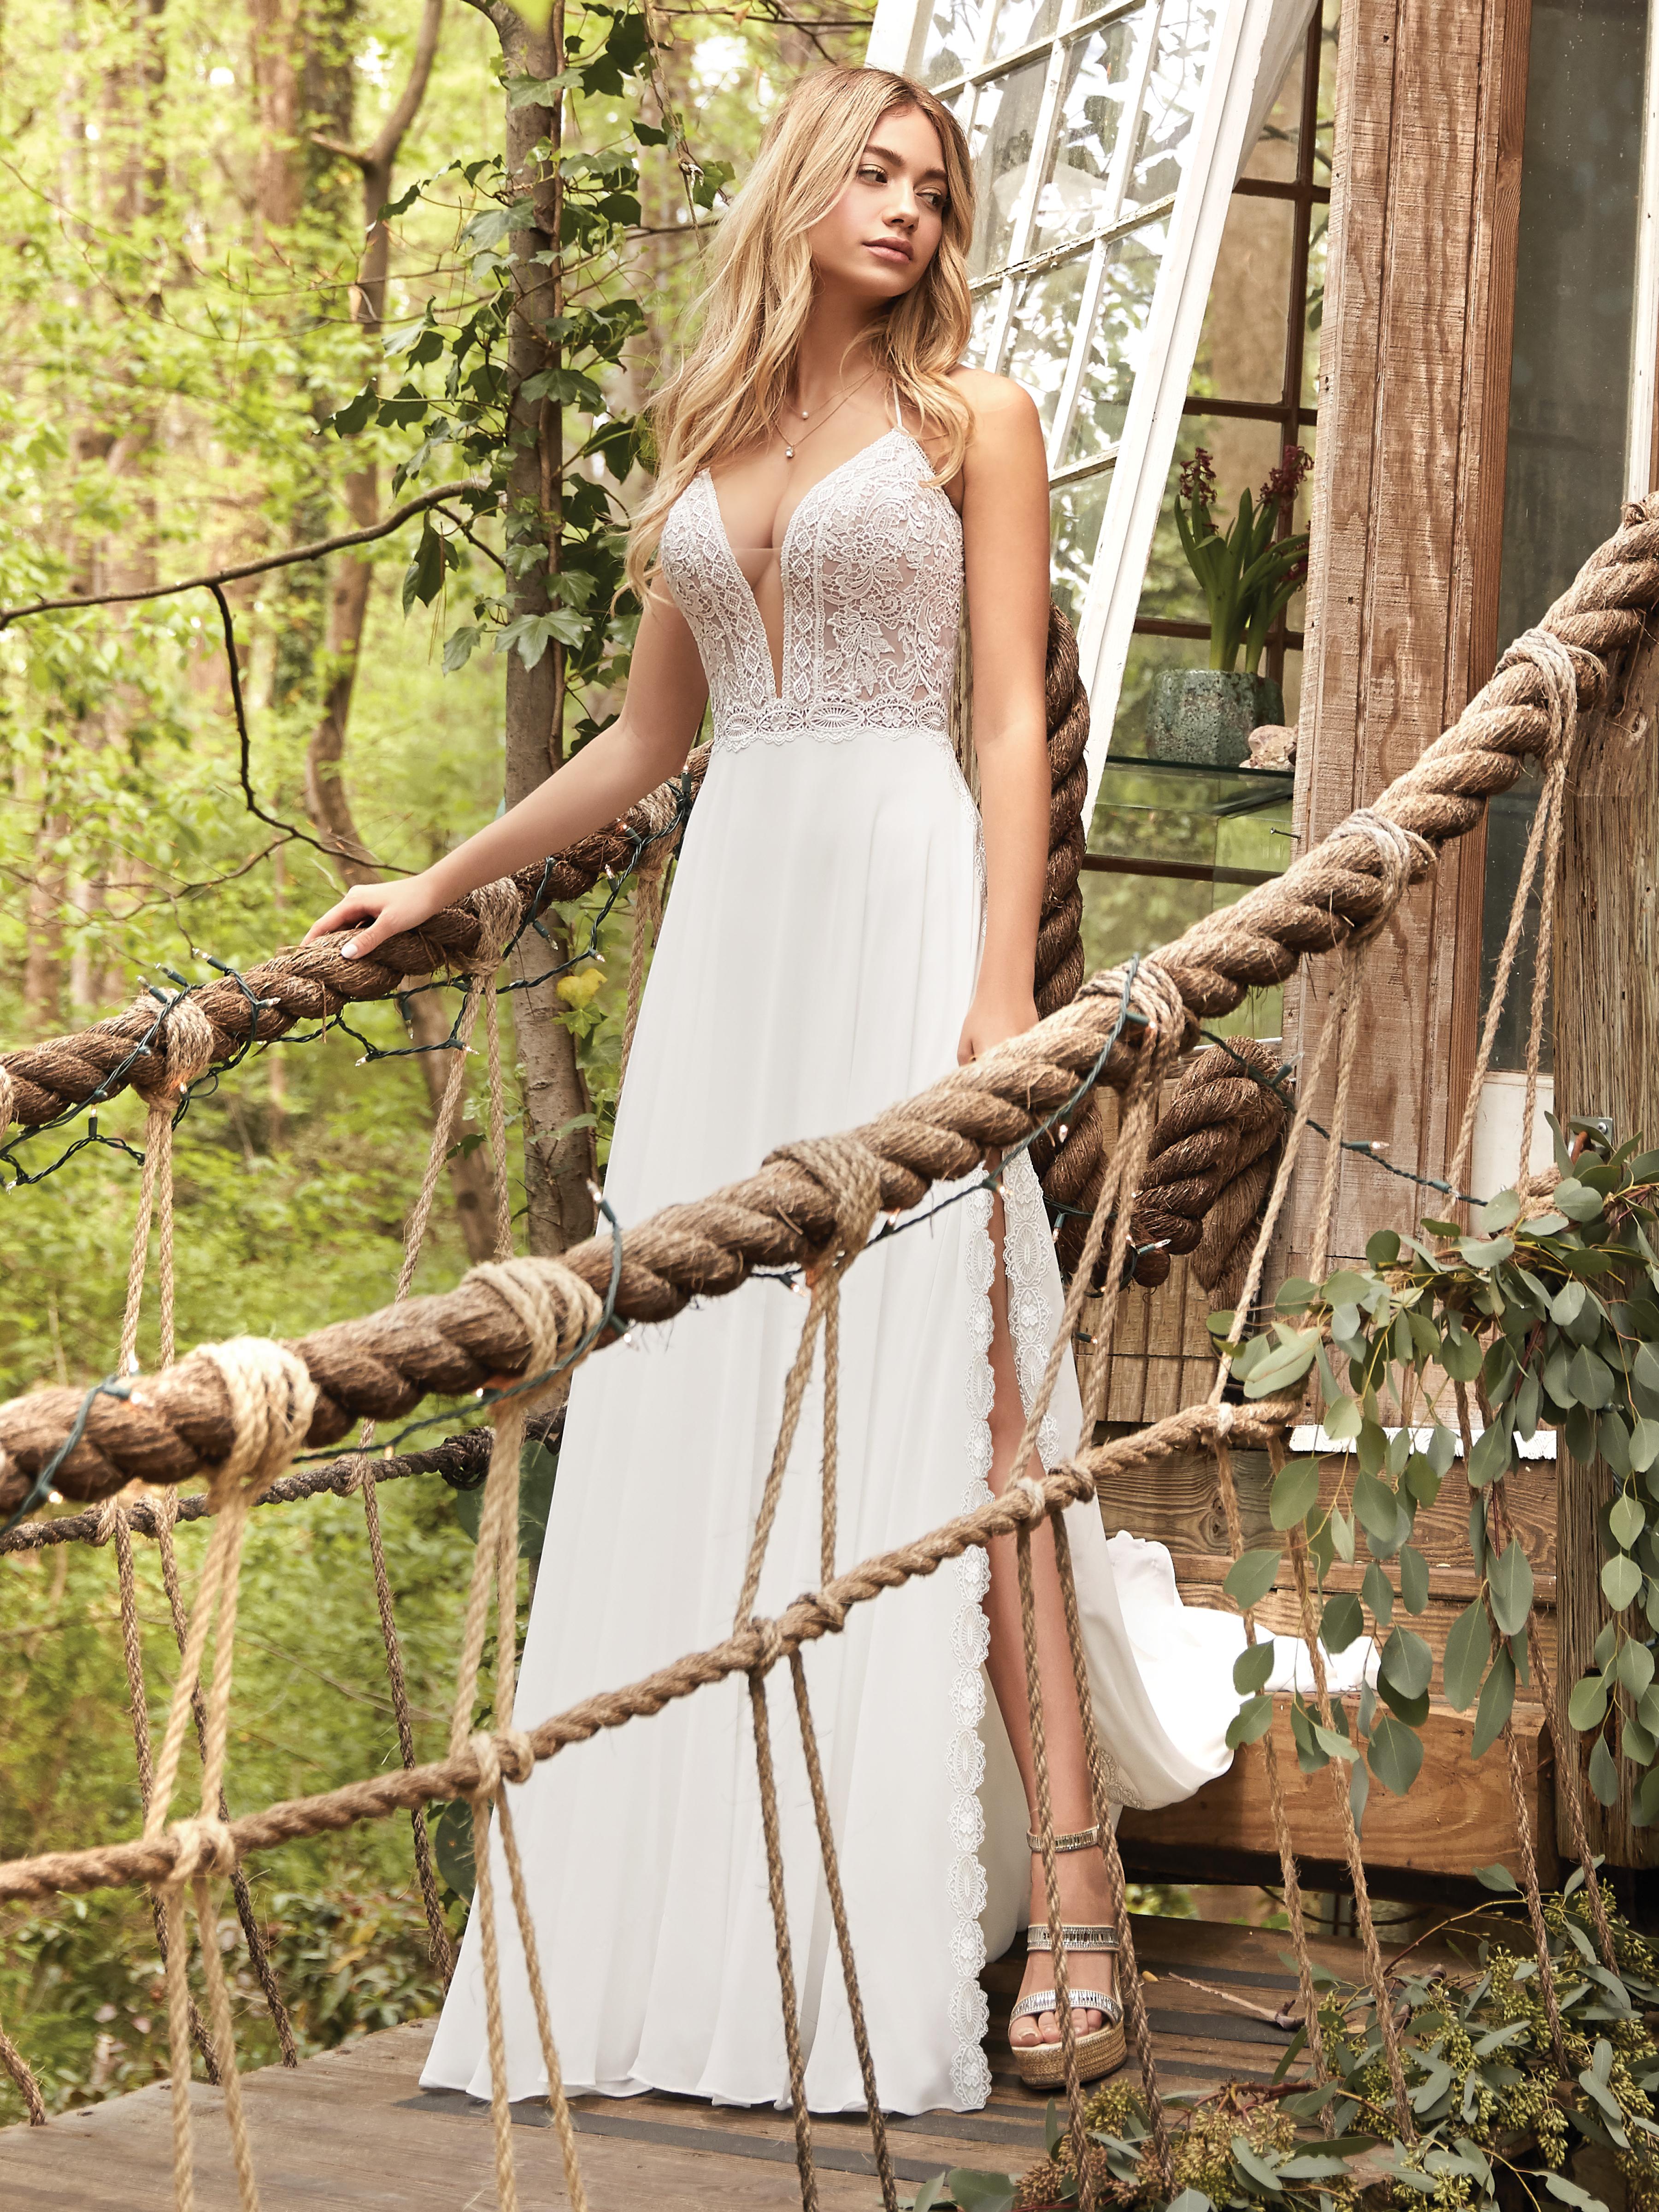 Bride Wearing A-line Chiffon Wedding Dress Called Nicole by Rebecca Ingram